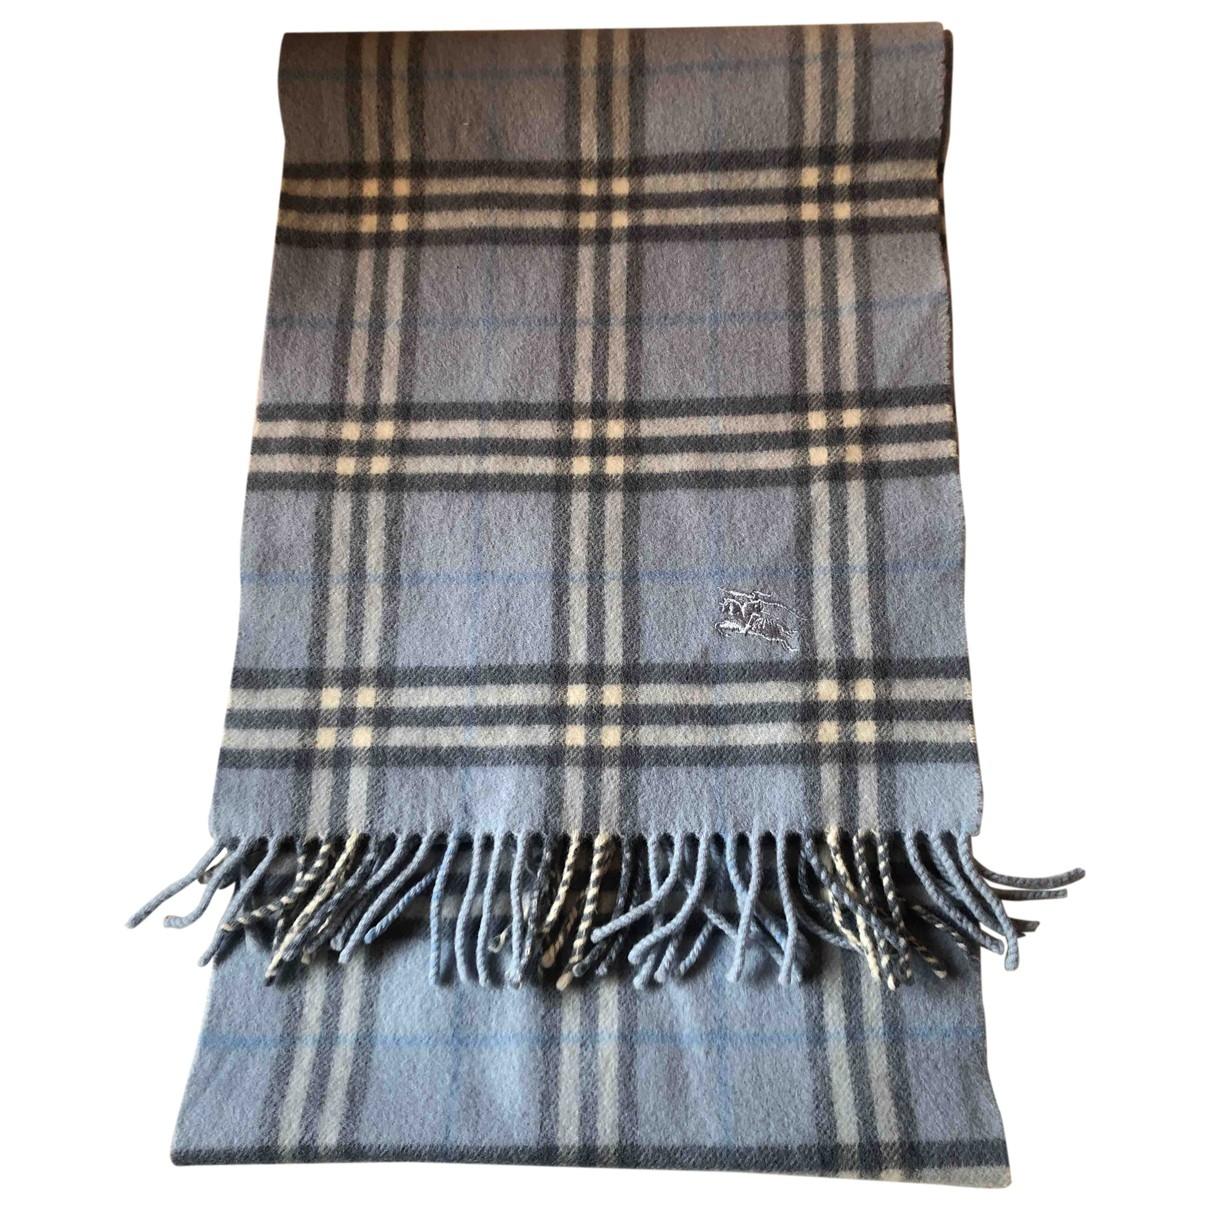 Burberry \N Blue Wool scarf & pocket squares for Men \N